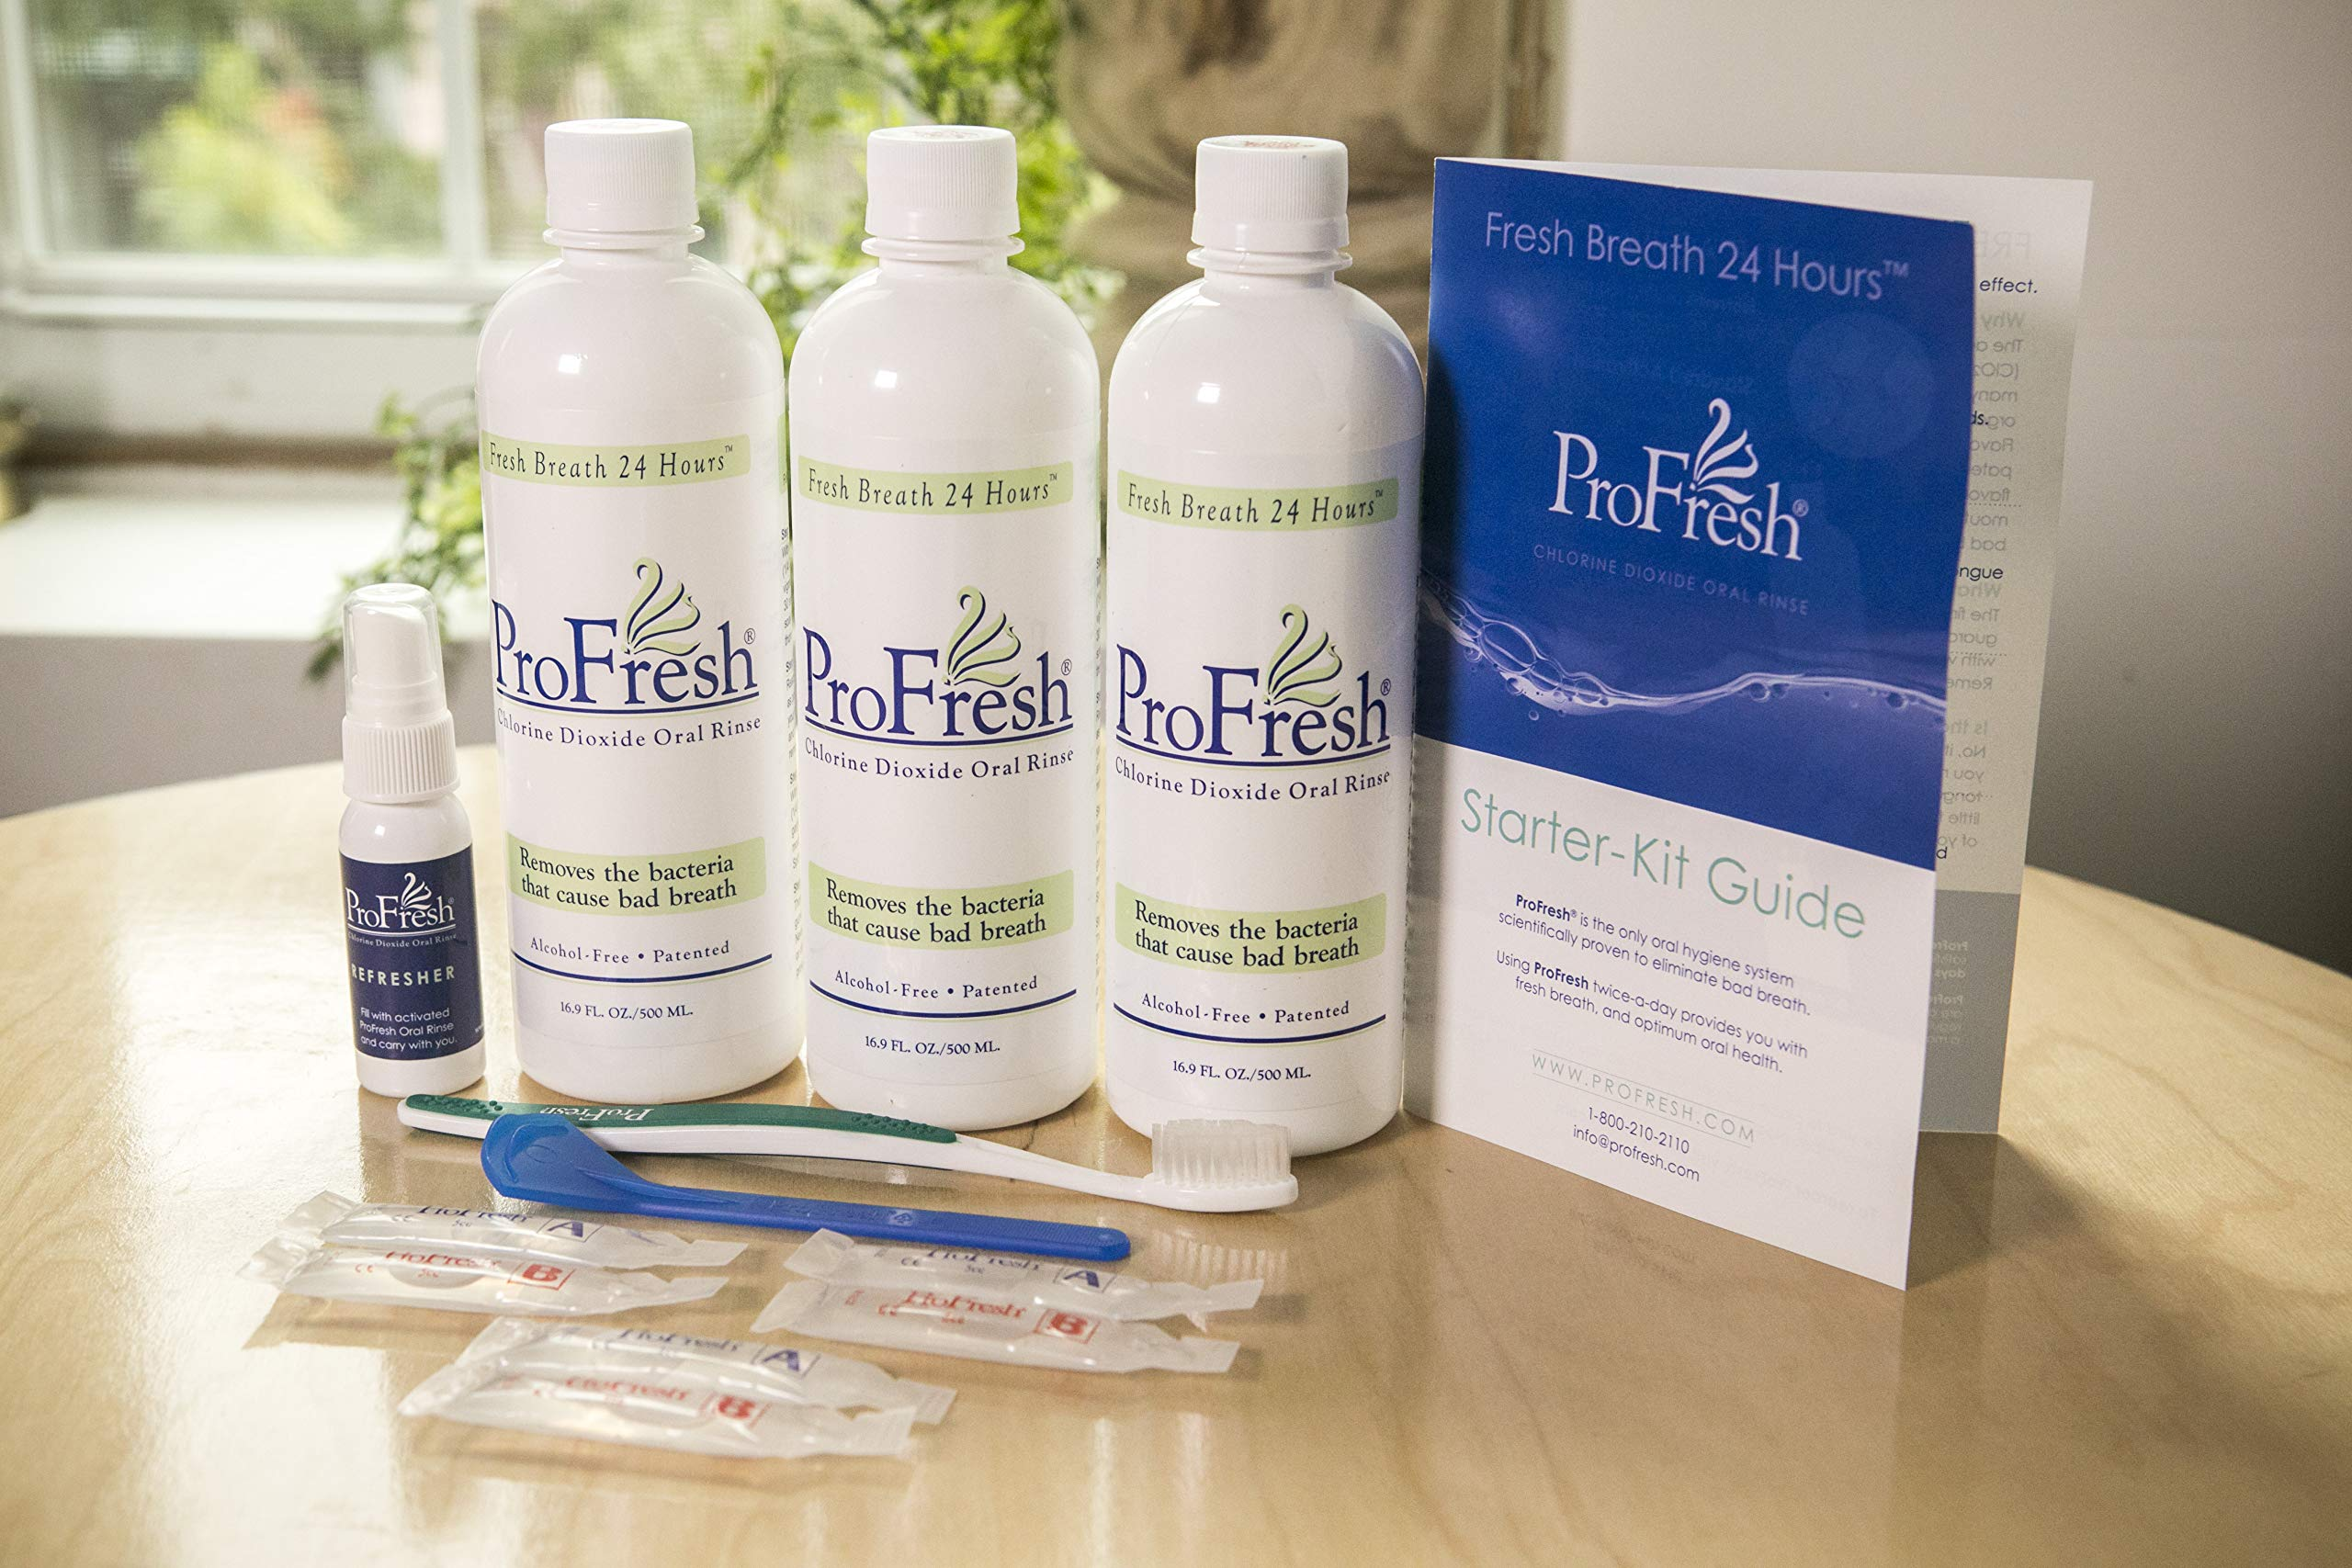 ProFresh BreathCare System Starter Kit, 6-Week Supply, Chlorine Dioxide Mouthwash-Oral Rinse. by ProFresh